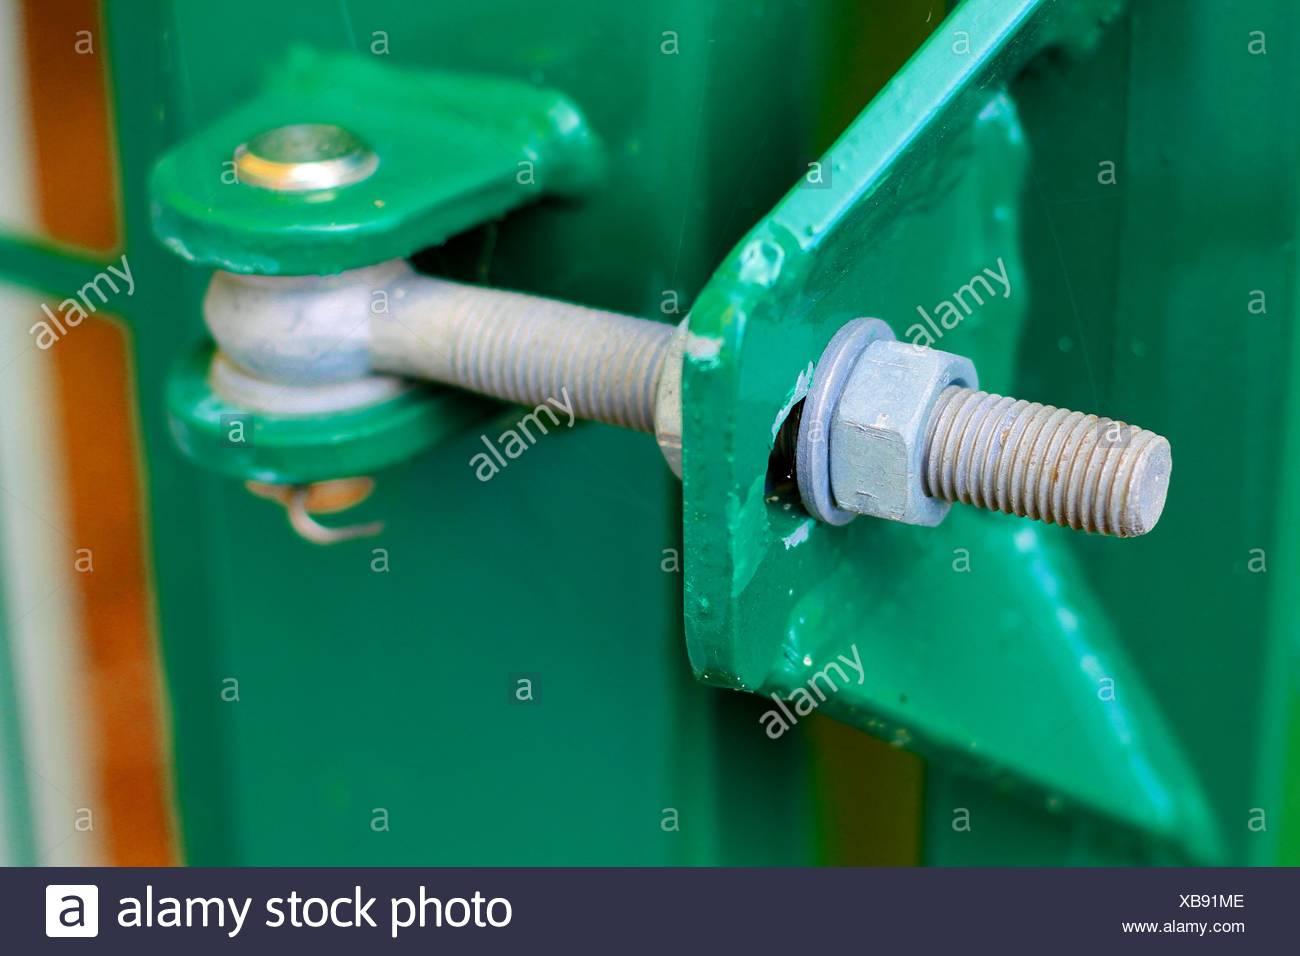 Metal hinge - Stock Image